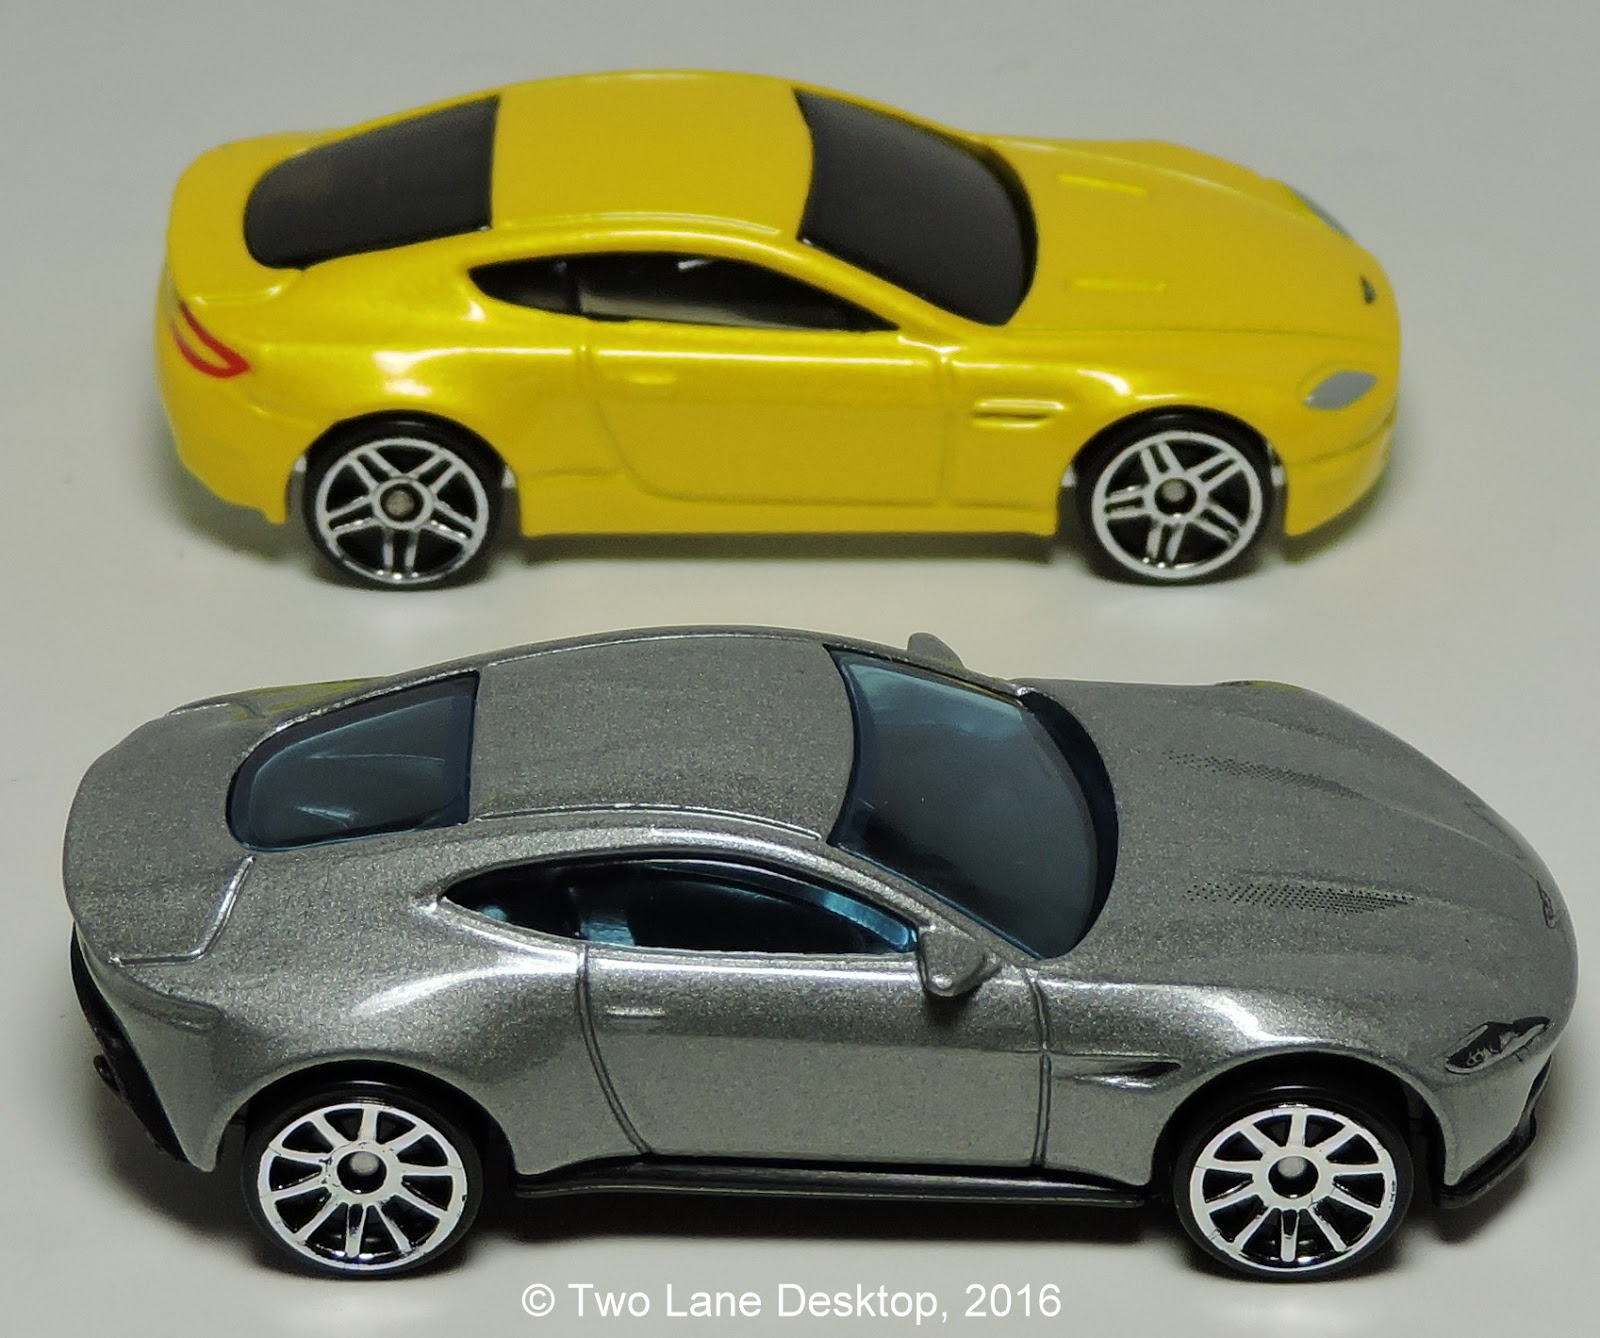 Two Lane Desktop: 007 Aston Martin's: Hot Wheels Aston